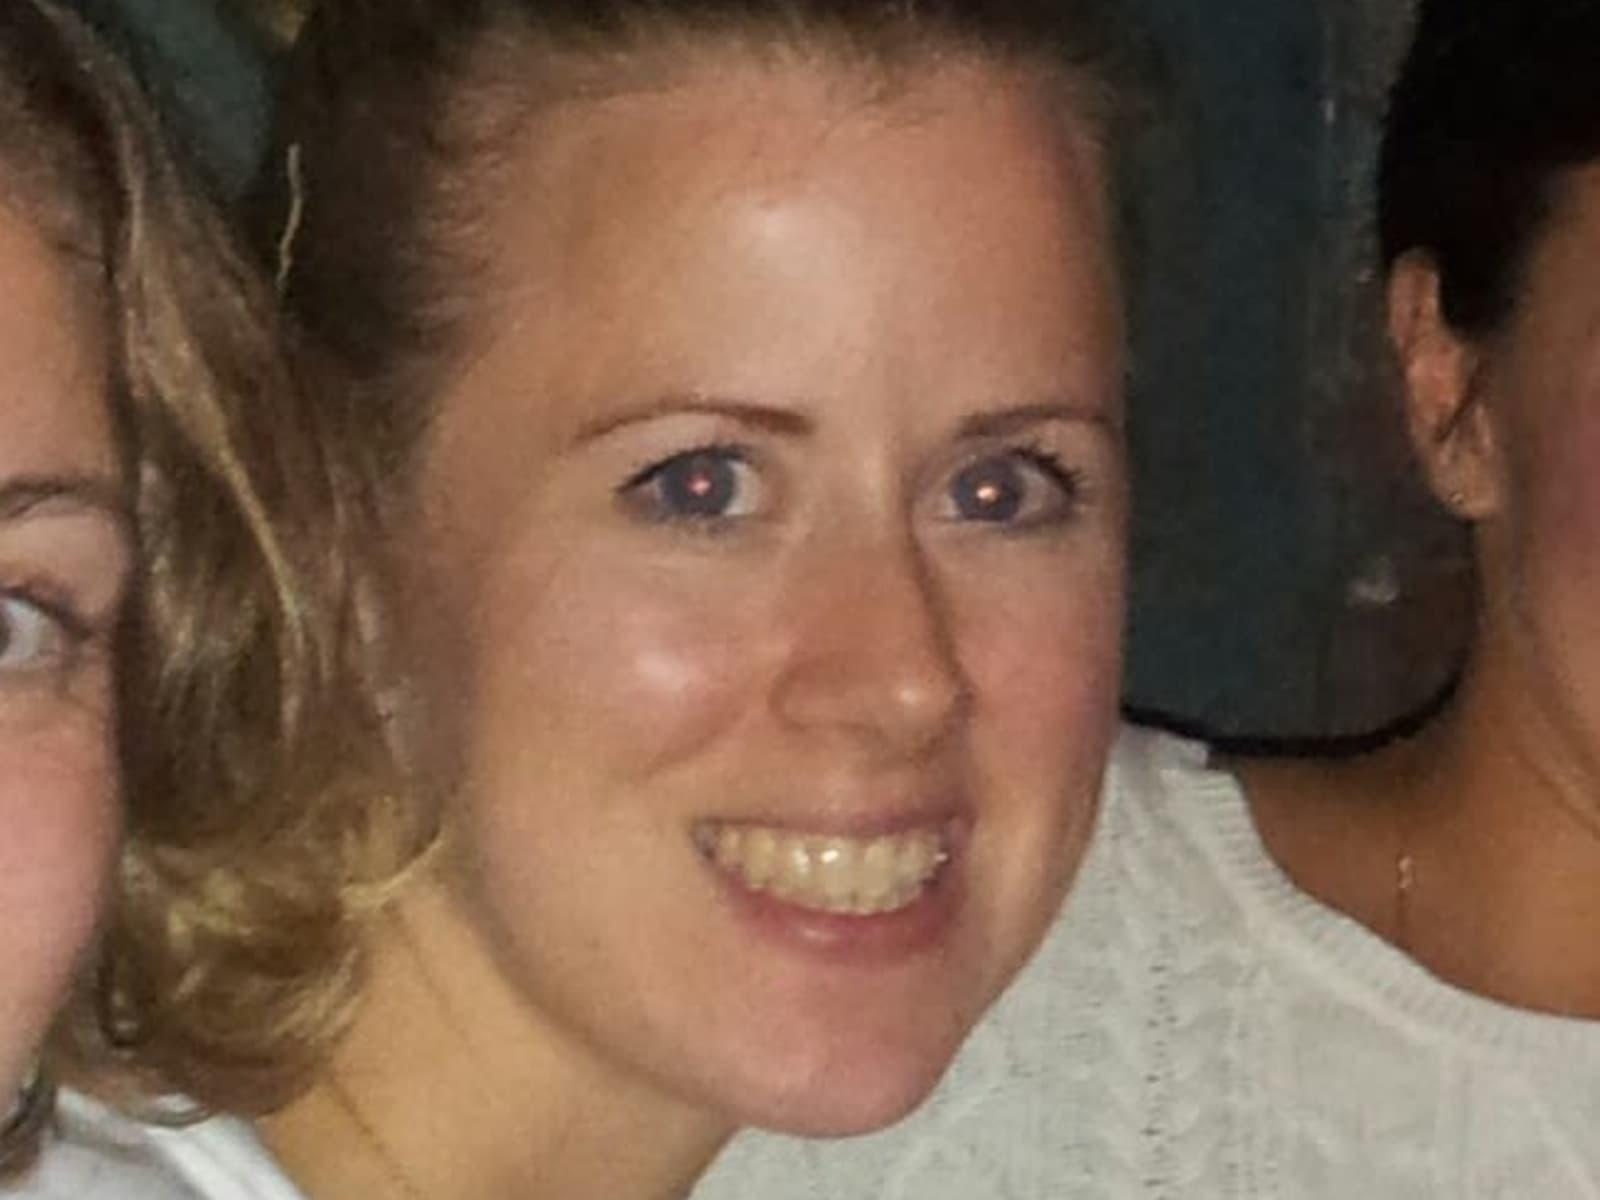 Beth from Goring-by-Sea, United Kingdom